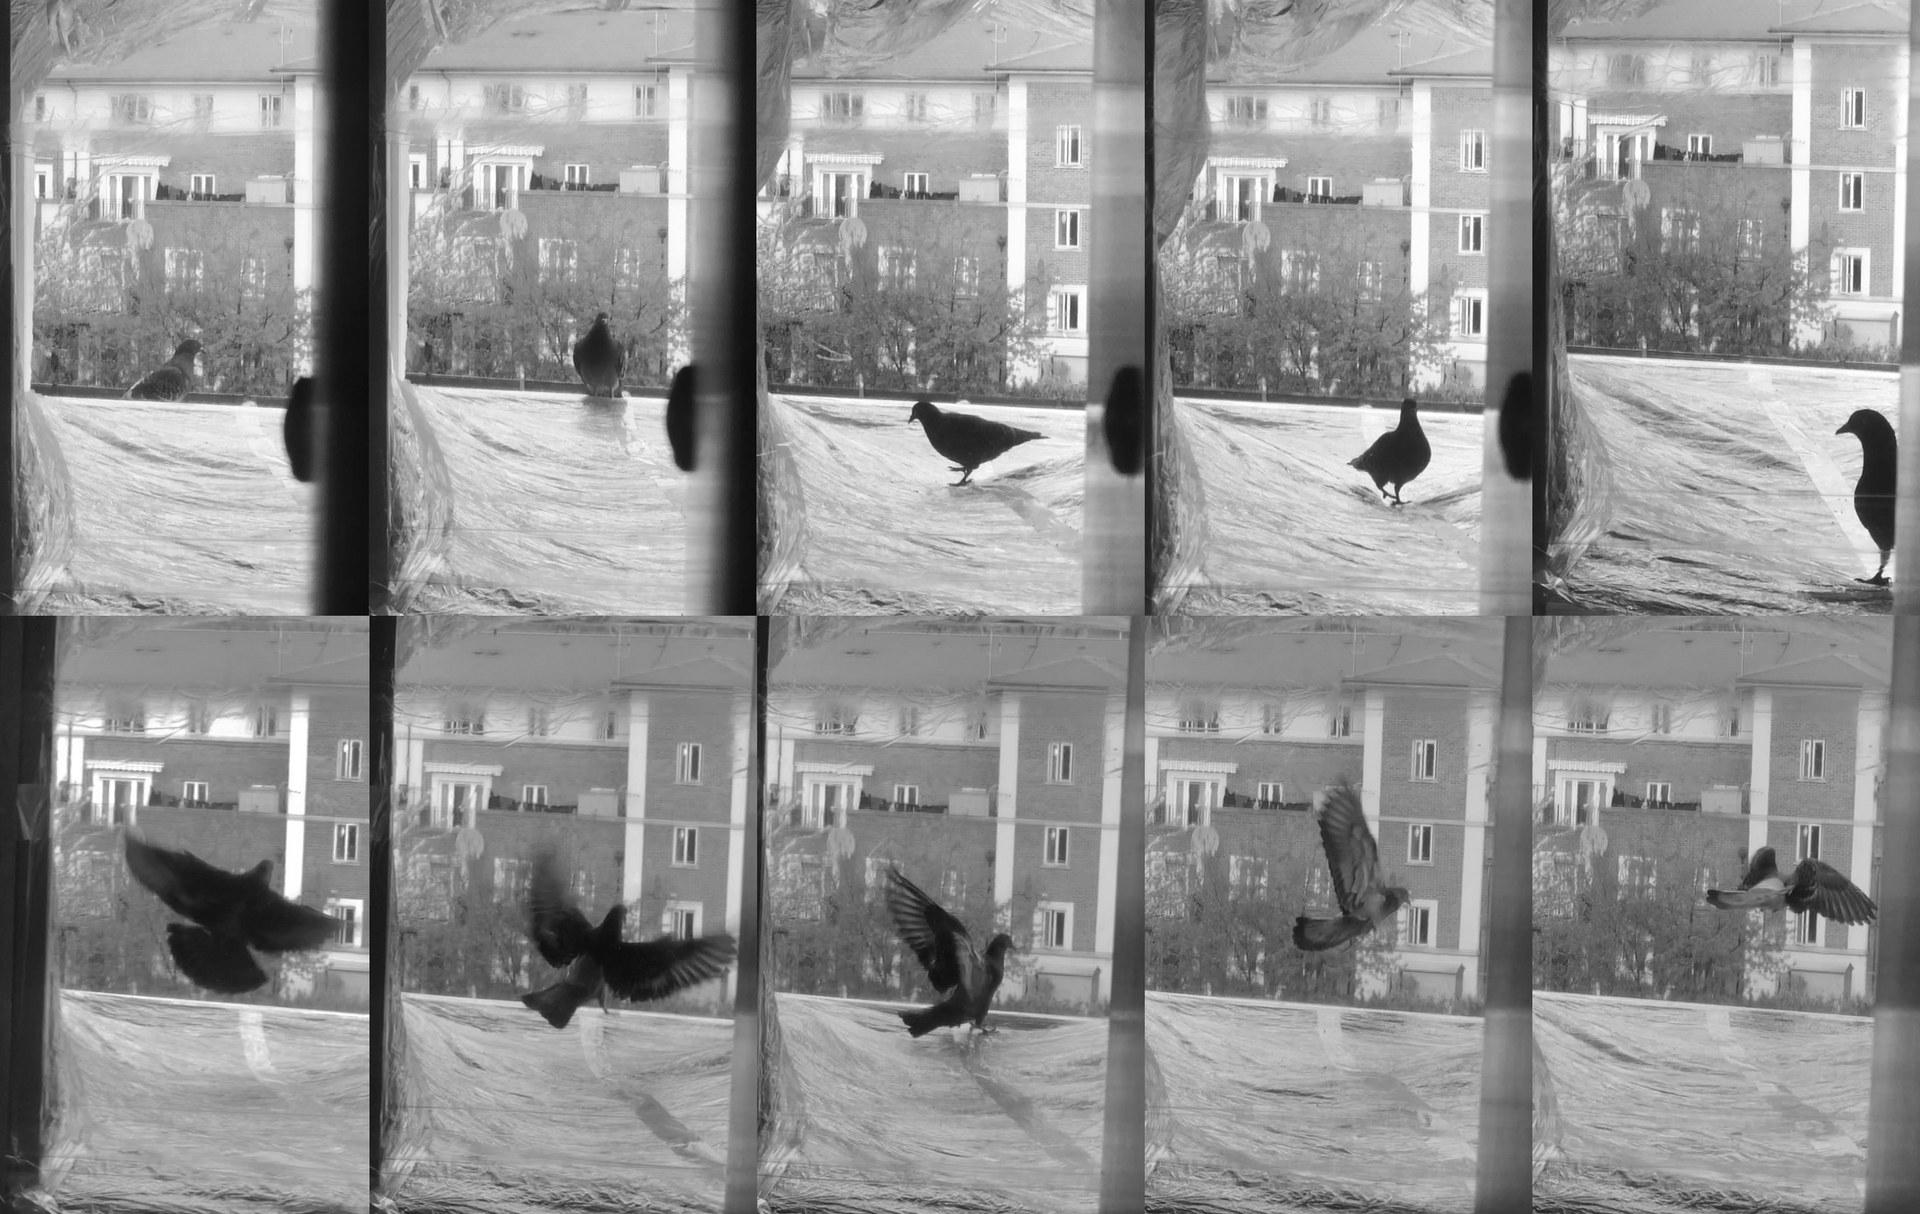 pigeon | 01:43 pm, 19 April | bridge II